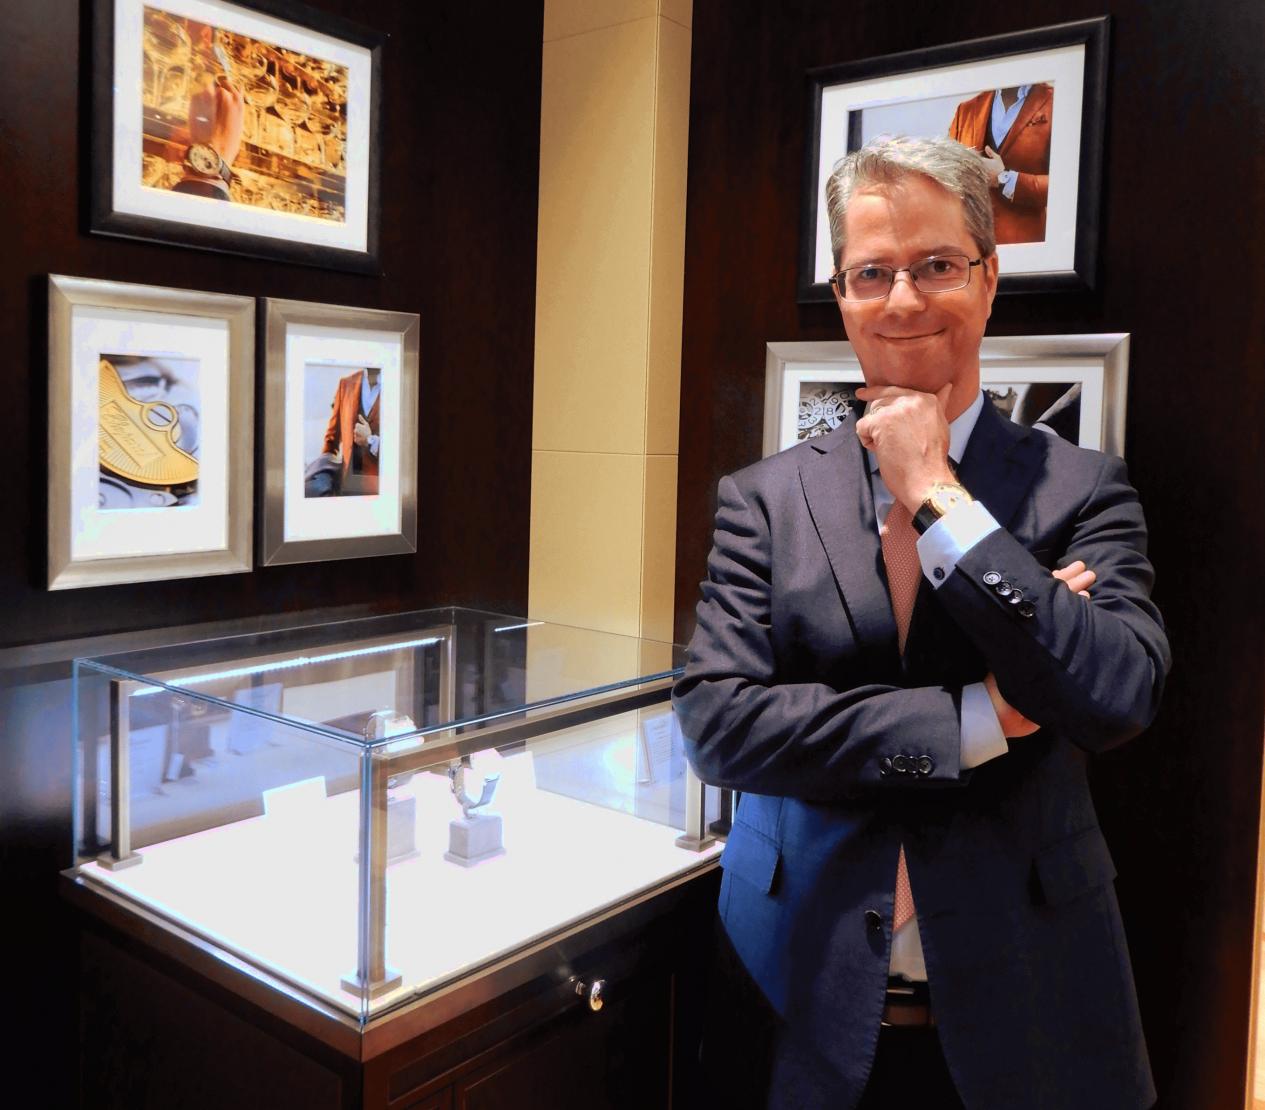 Meet the SCCIJ Members #2 – Thomas Doebeli, General Manager, Chopard Japan